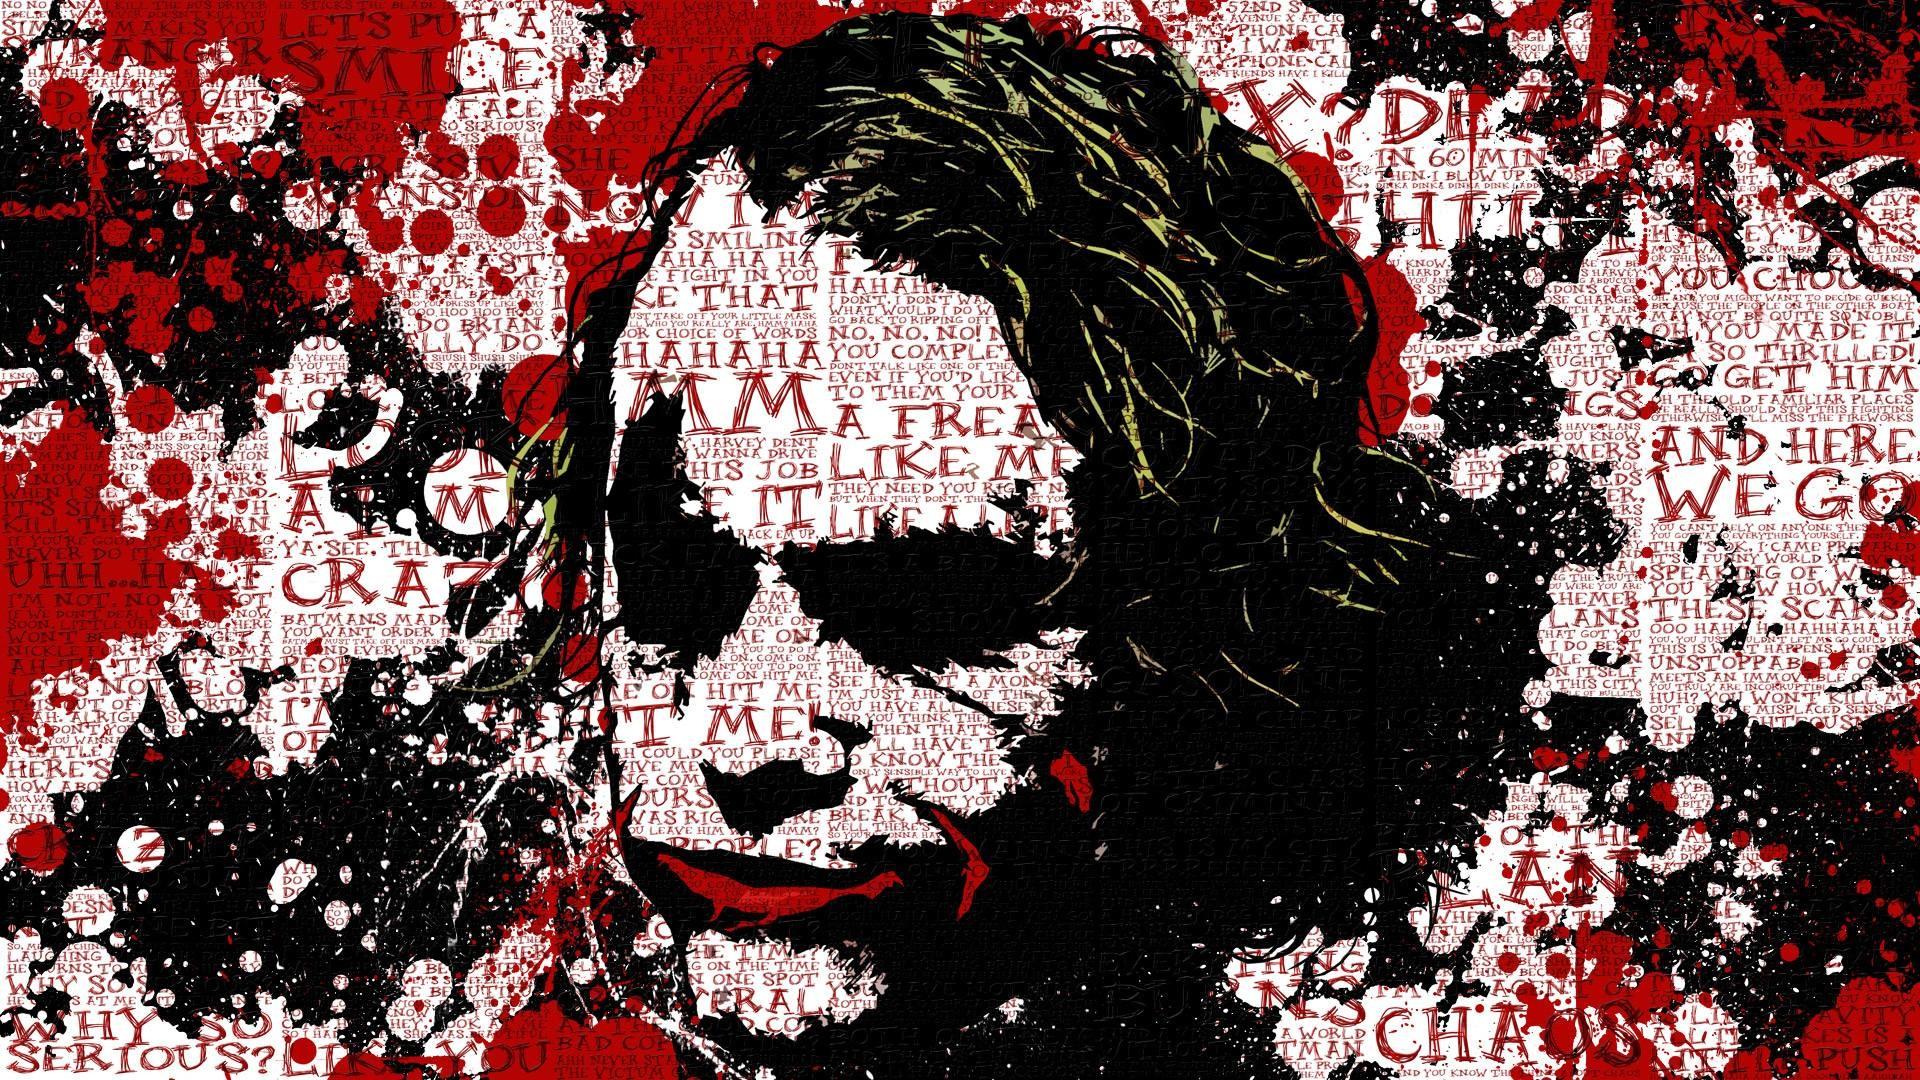 joker hd wallpaper 1080p